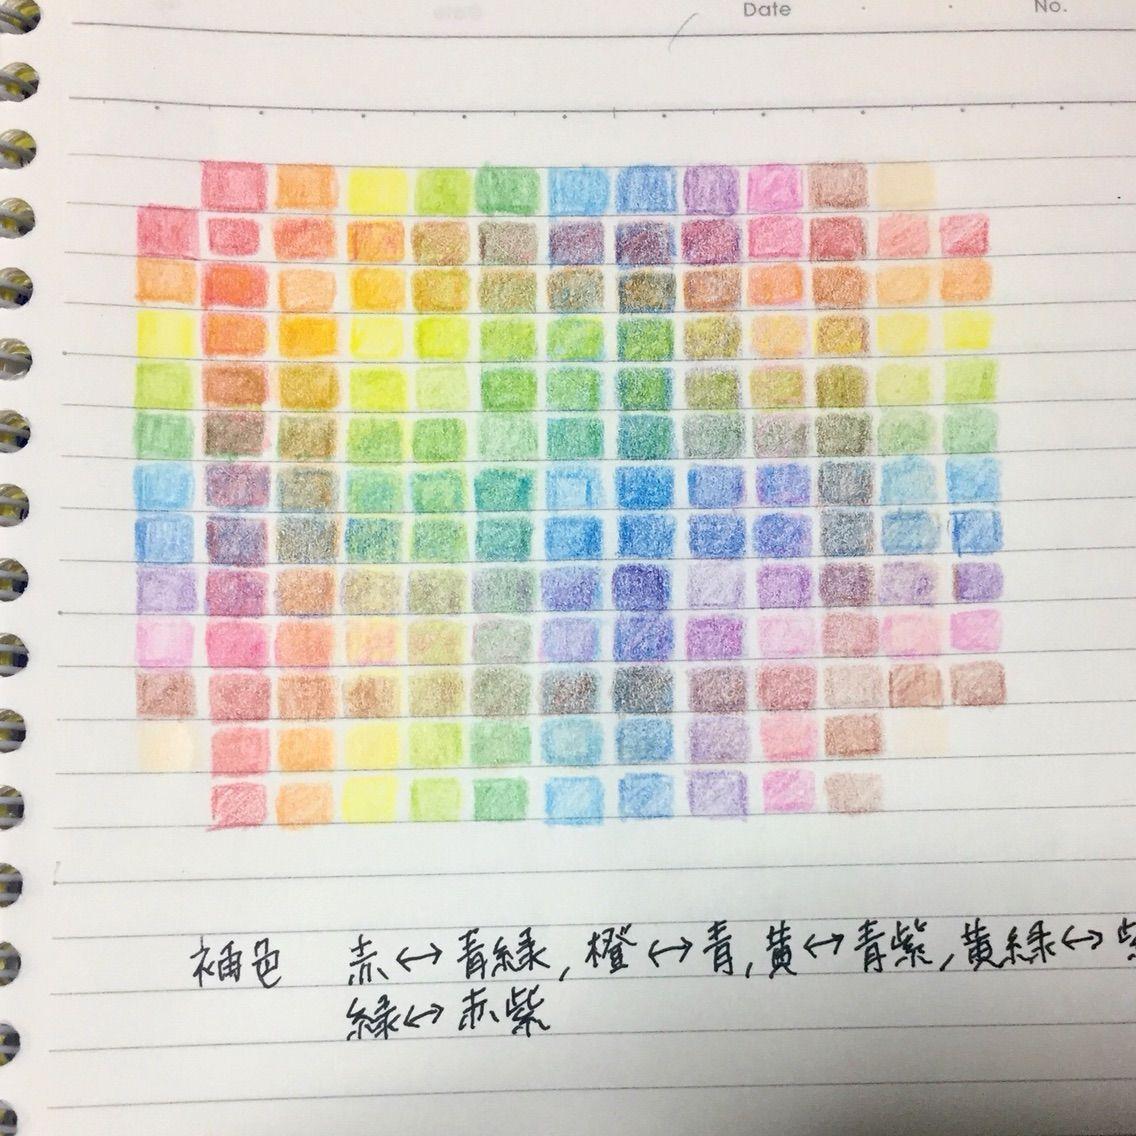 #colorpencil #coloredpencil #muji #coloriage #色鉛筆 #カラーチャート #無印色鉛筆